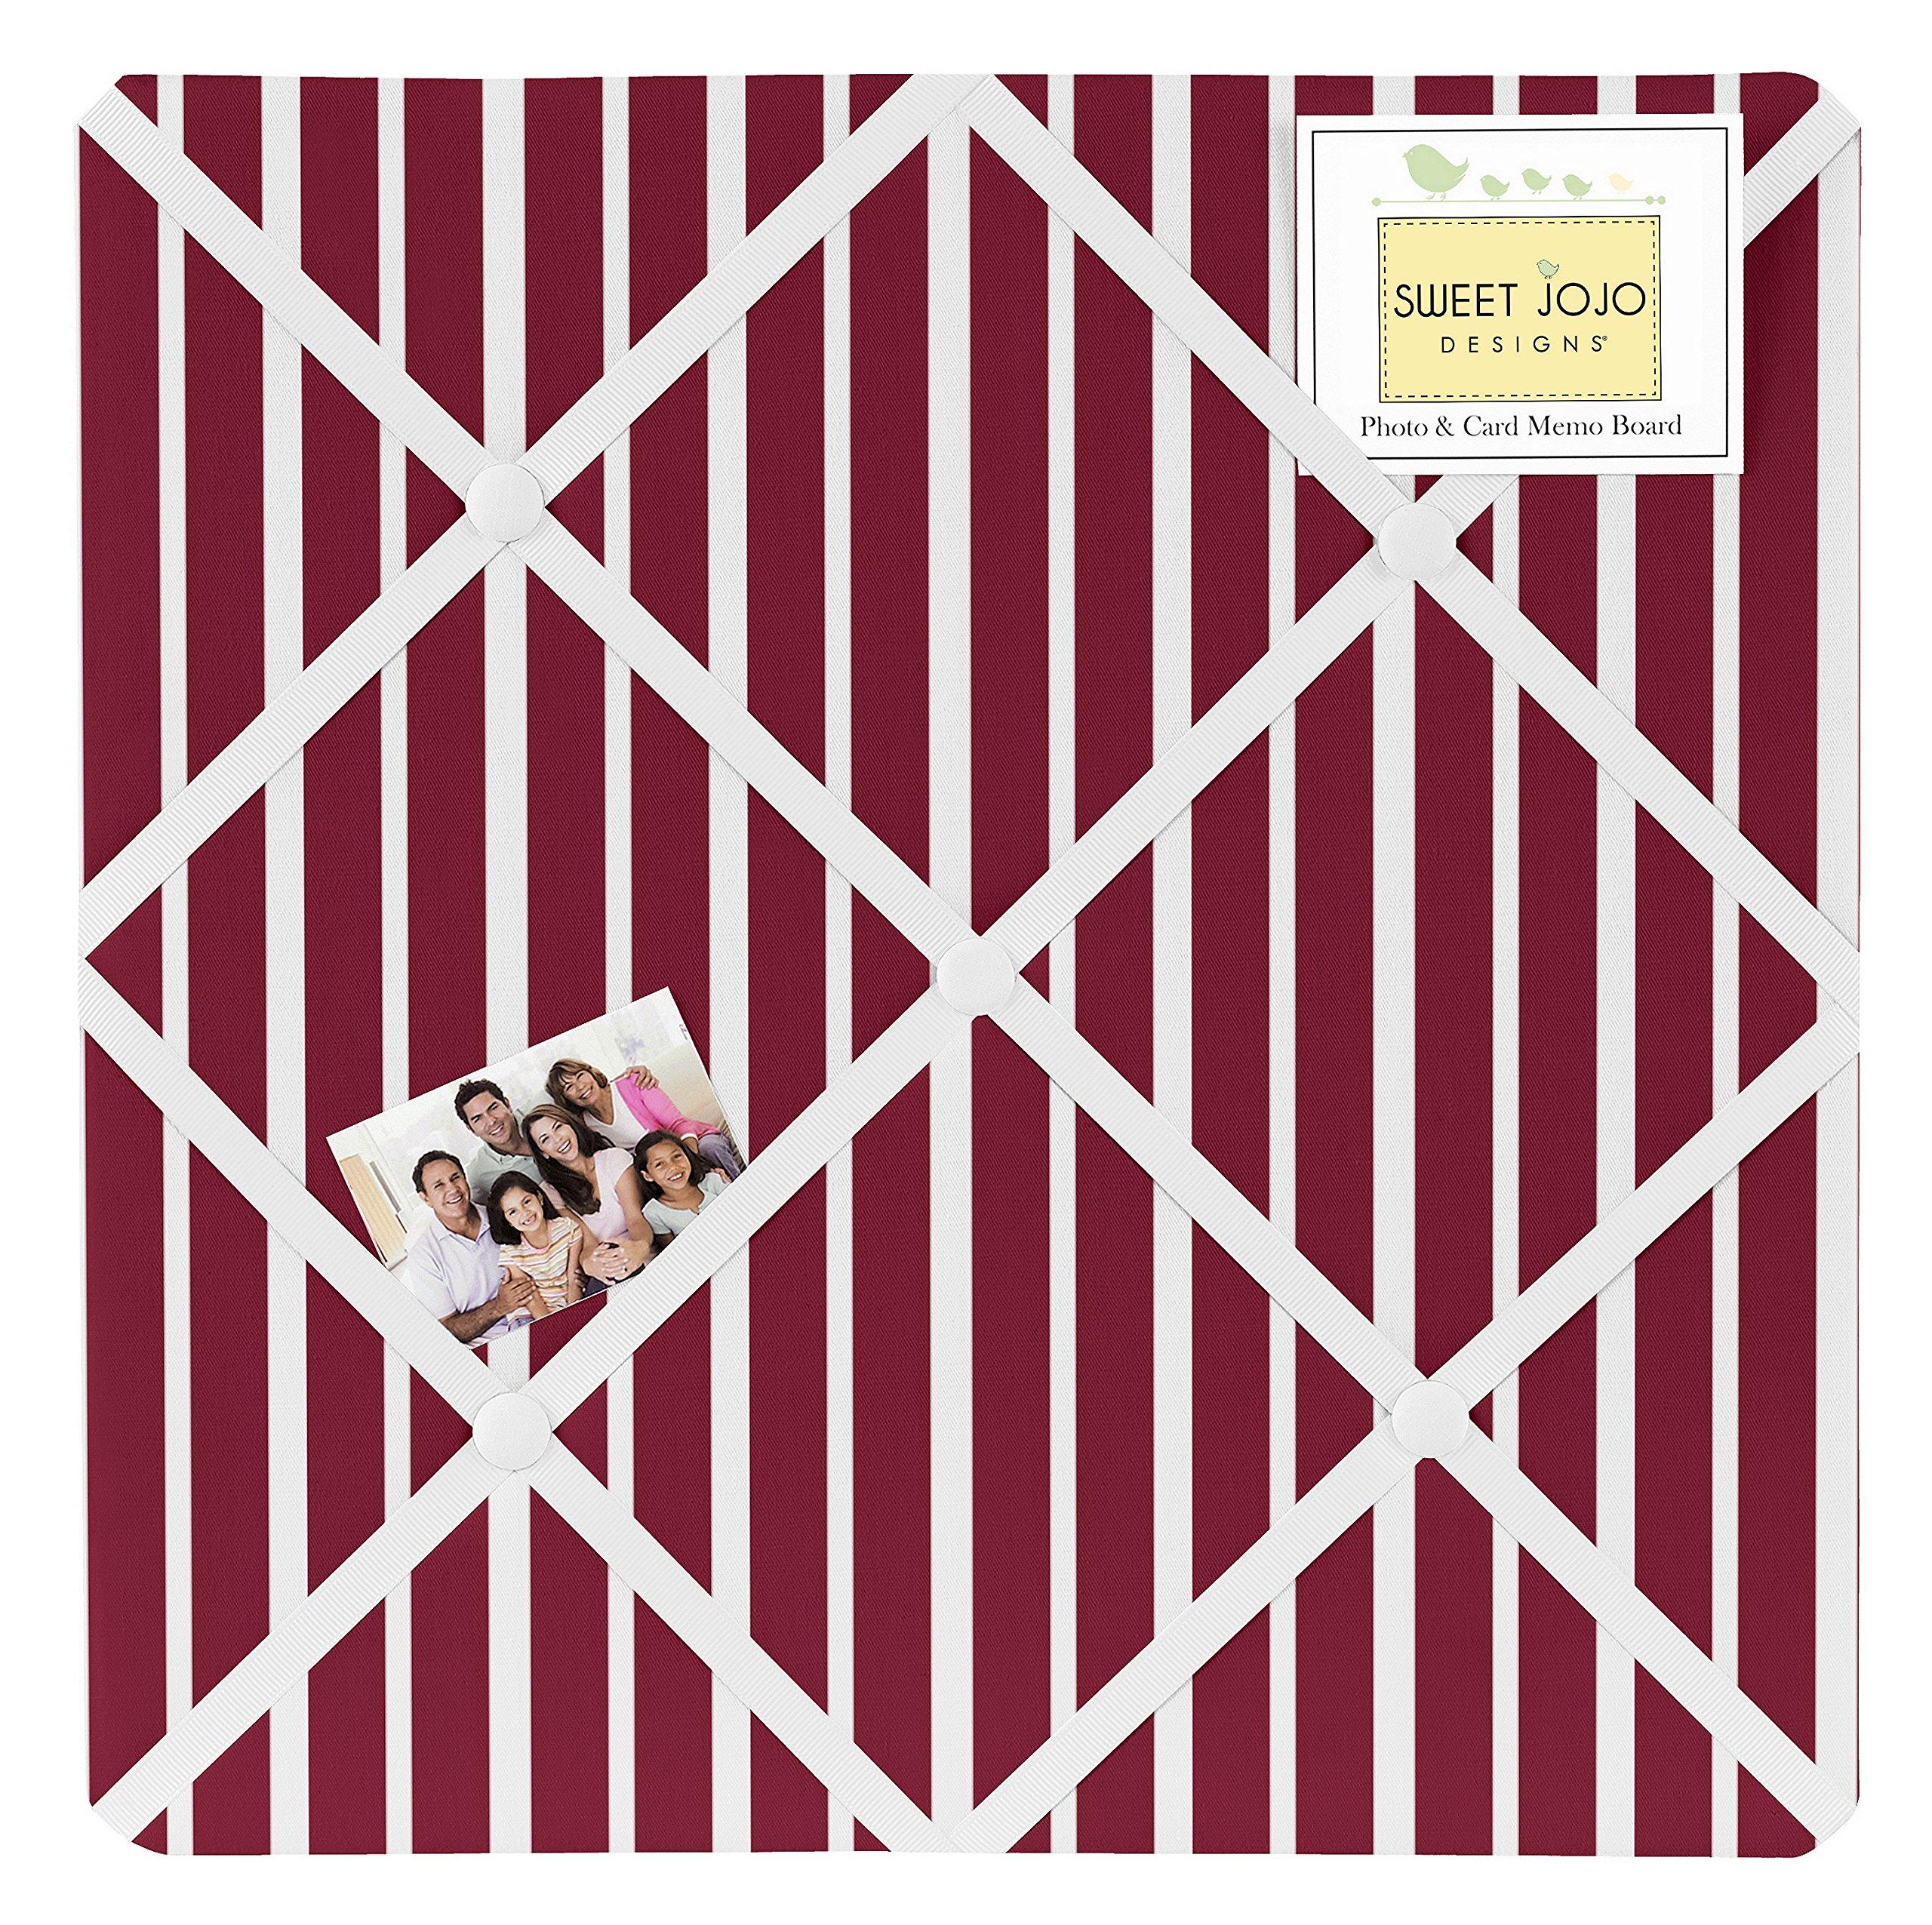 Sweet Jojo Designs Vintage Aviator Red Stripe Print Fabric Memory/Memo Photo Bulletin Board